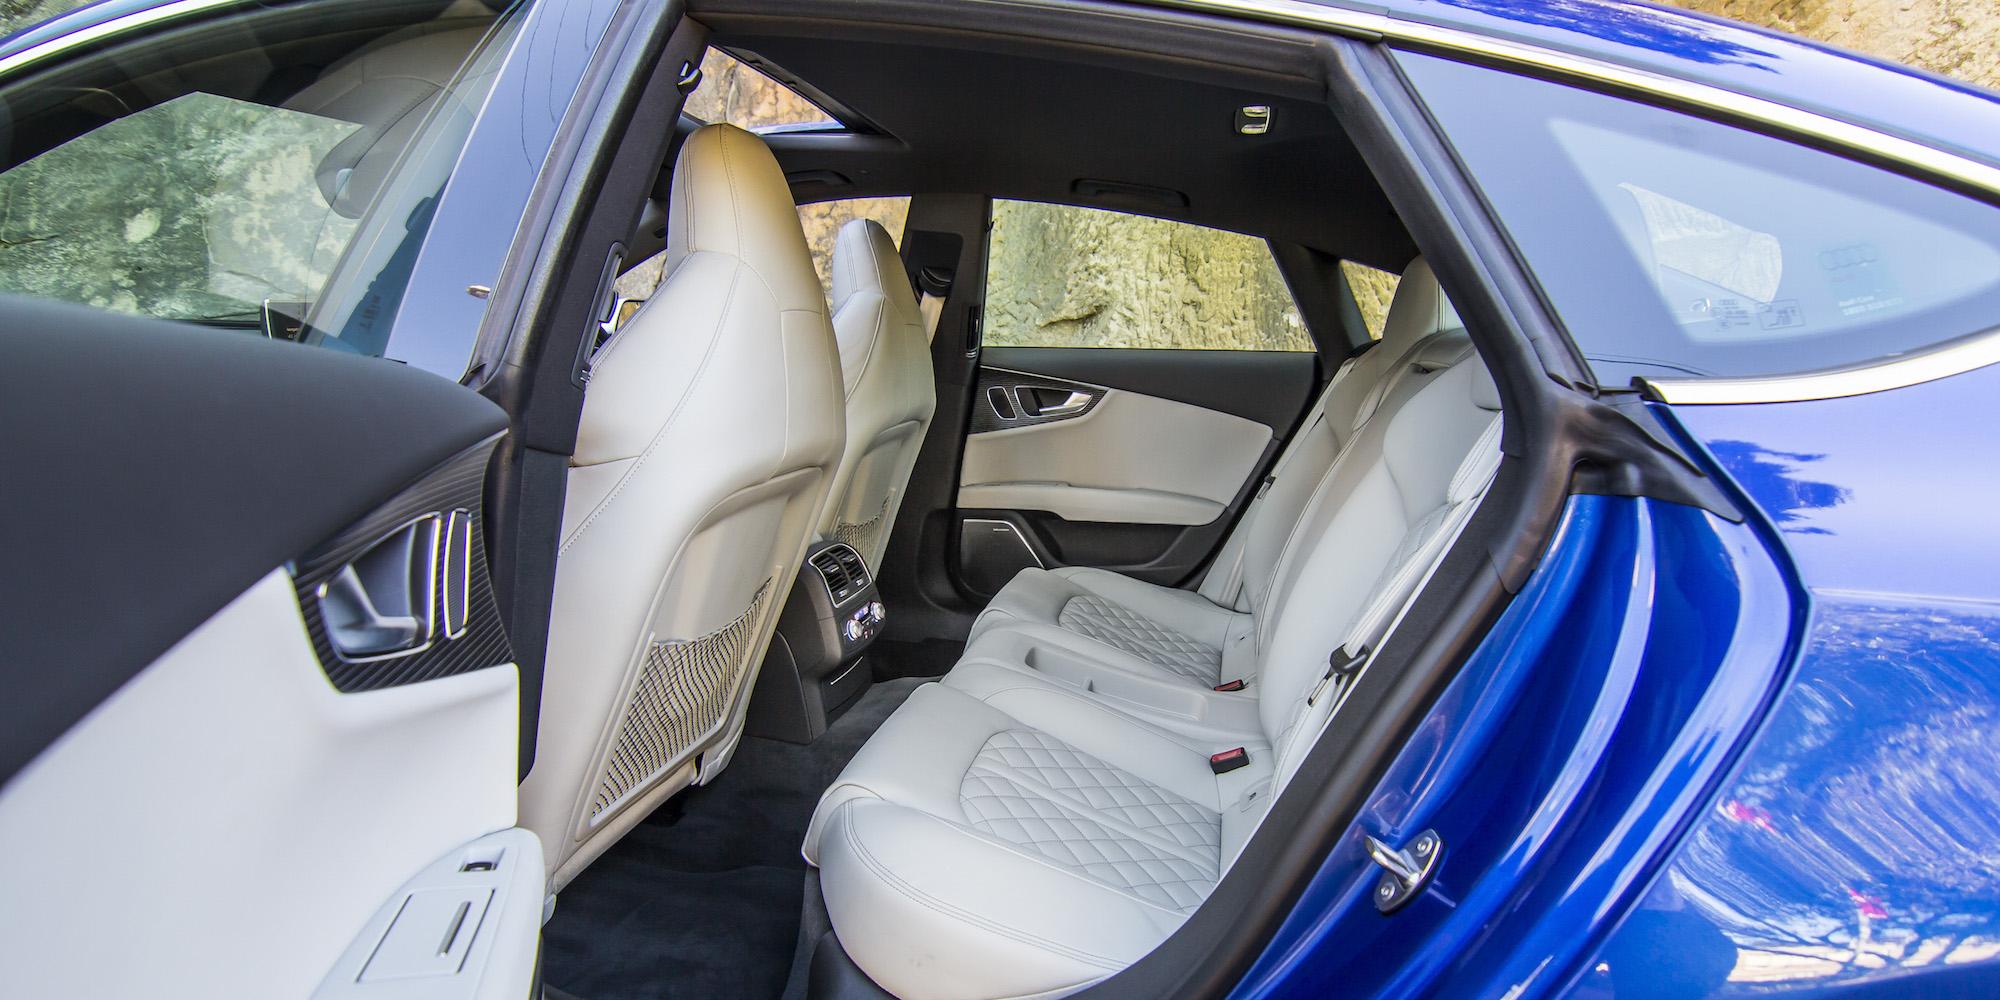 2016 Audi S7 Rear Seats Interior